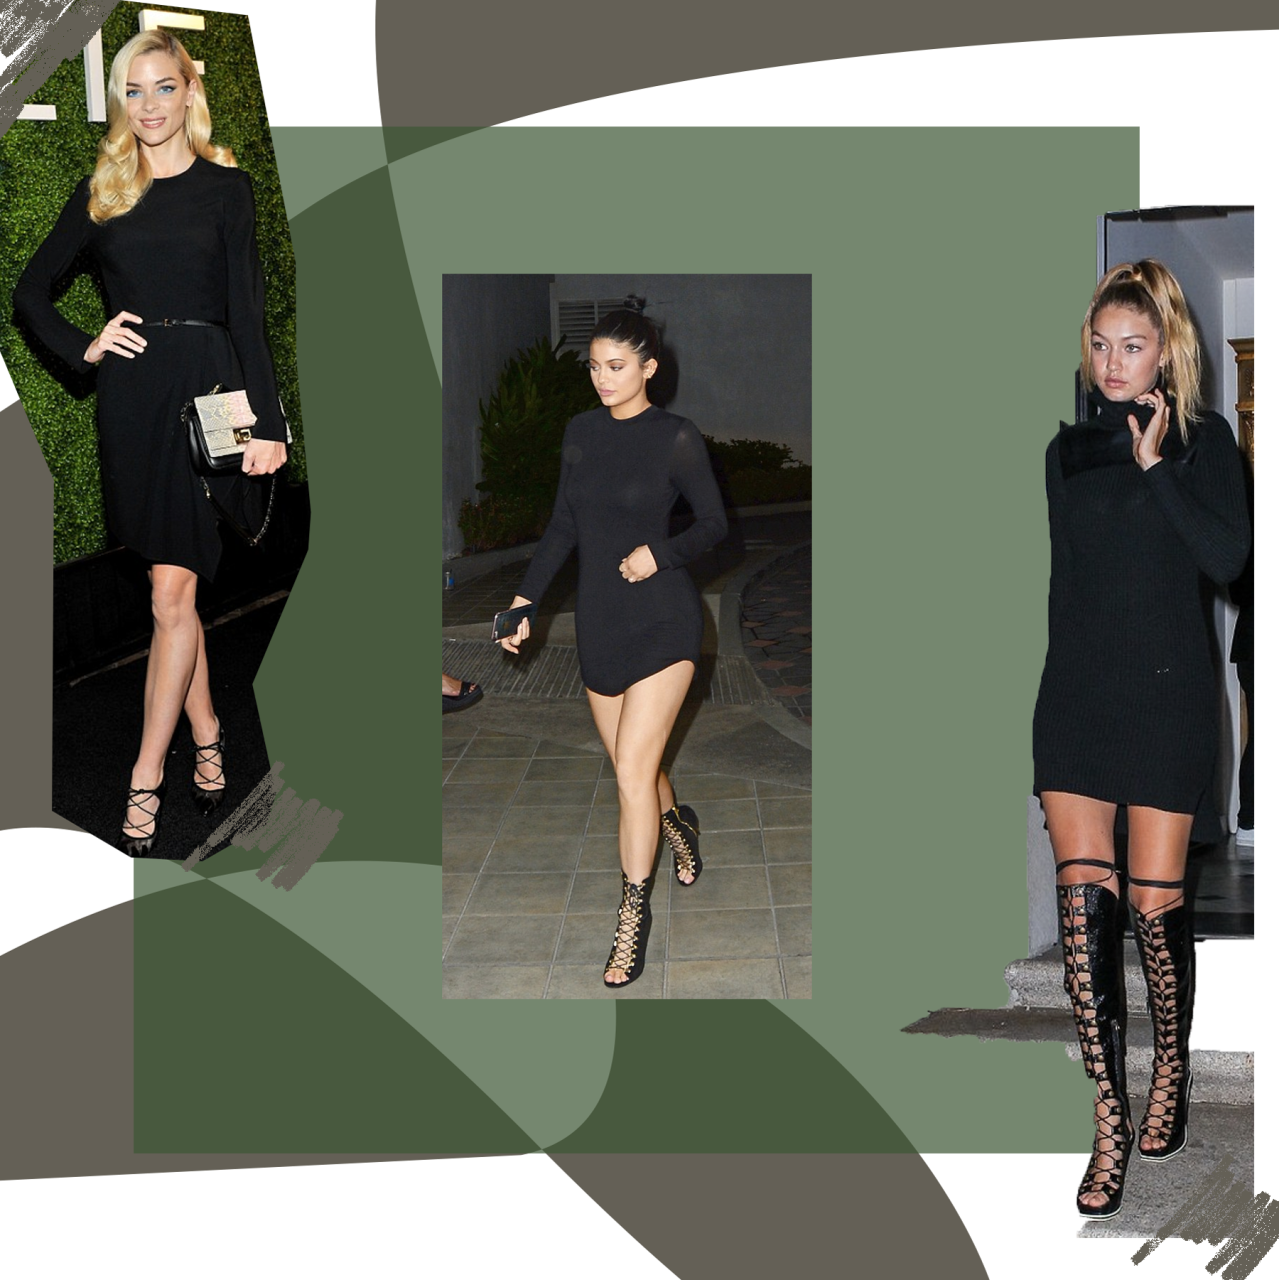 style-file-kylie-jenner-gigi-hadid-jamie-king-eco-fashion-vegan-fashion-black-dress-the-great-beyond